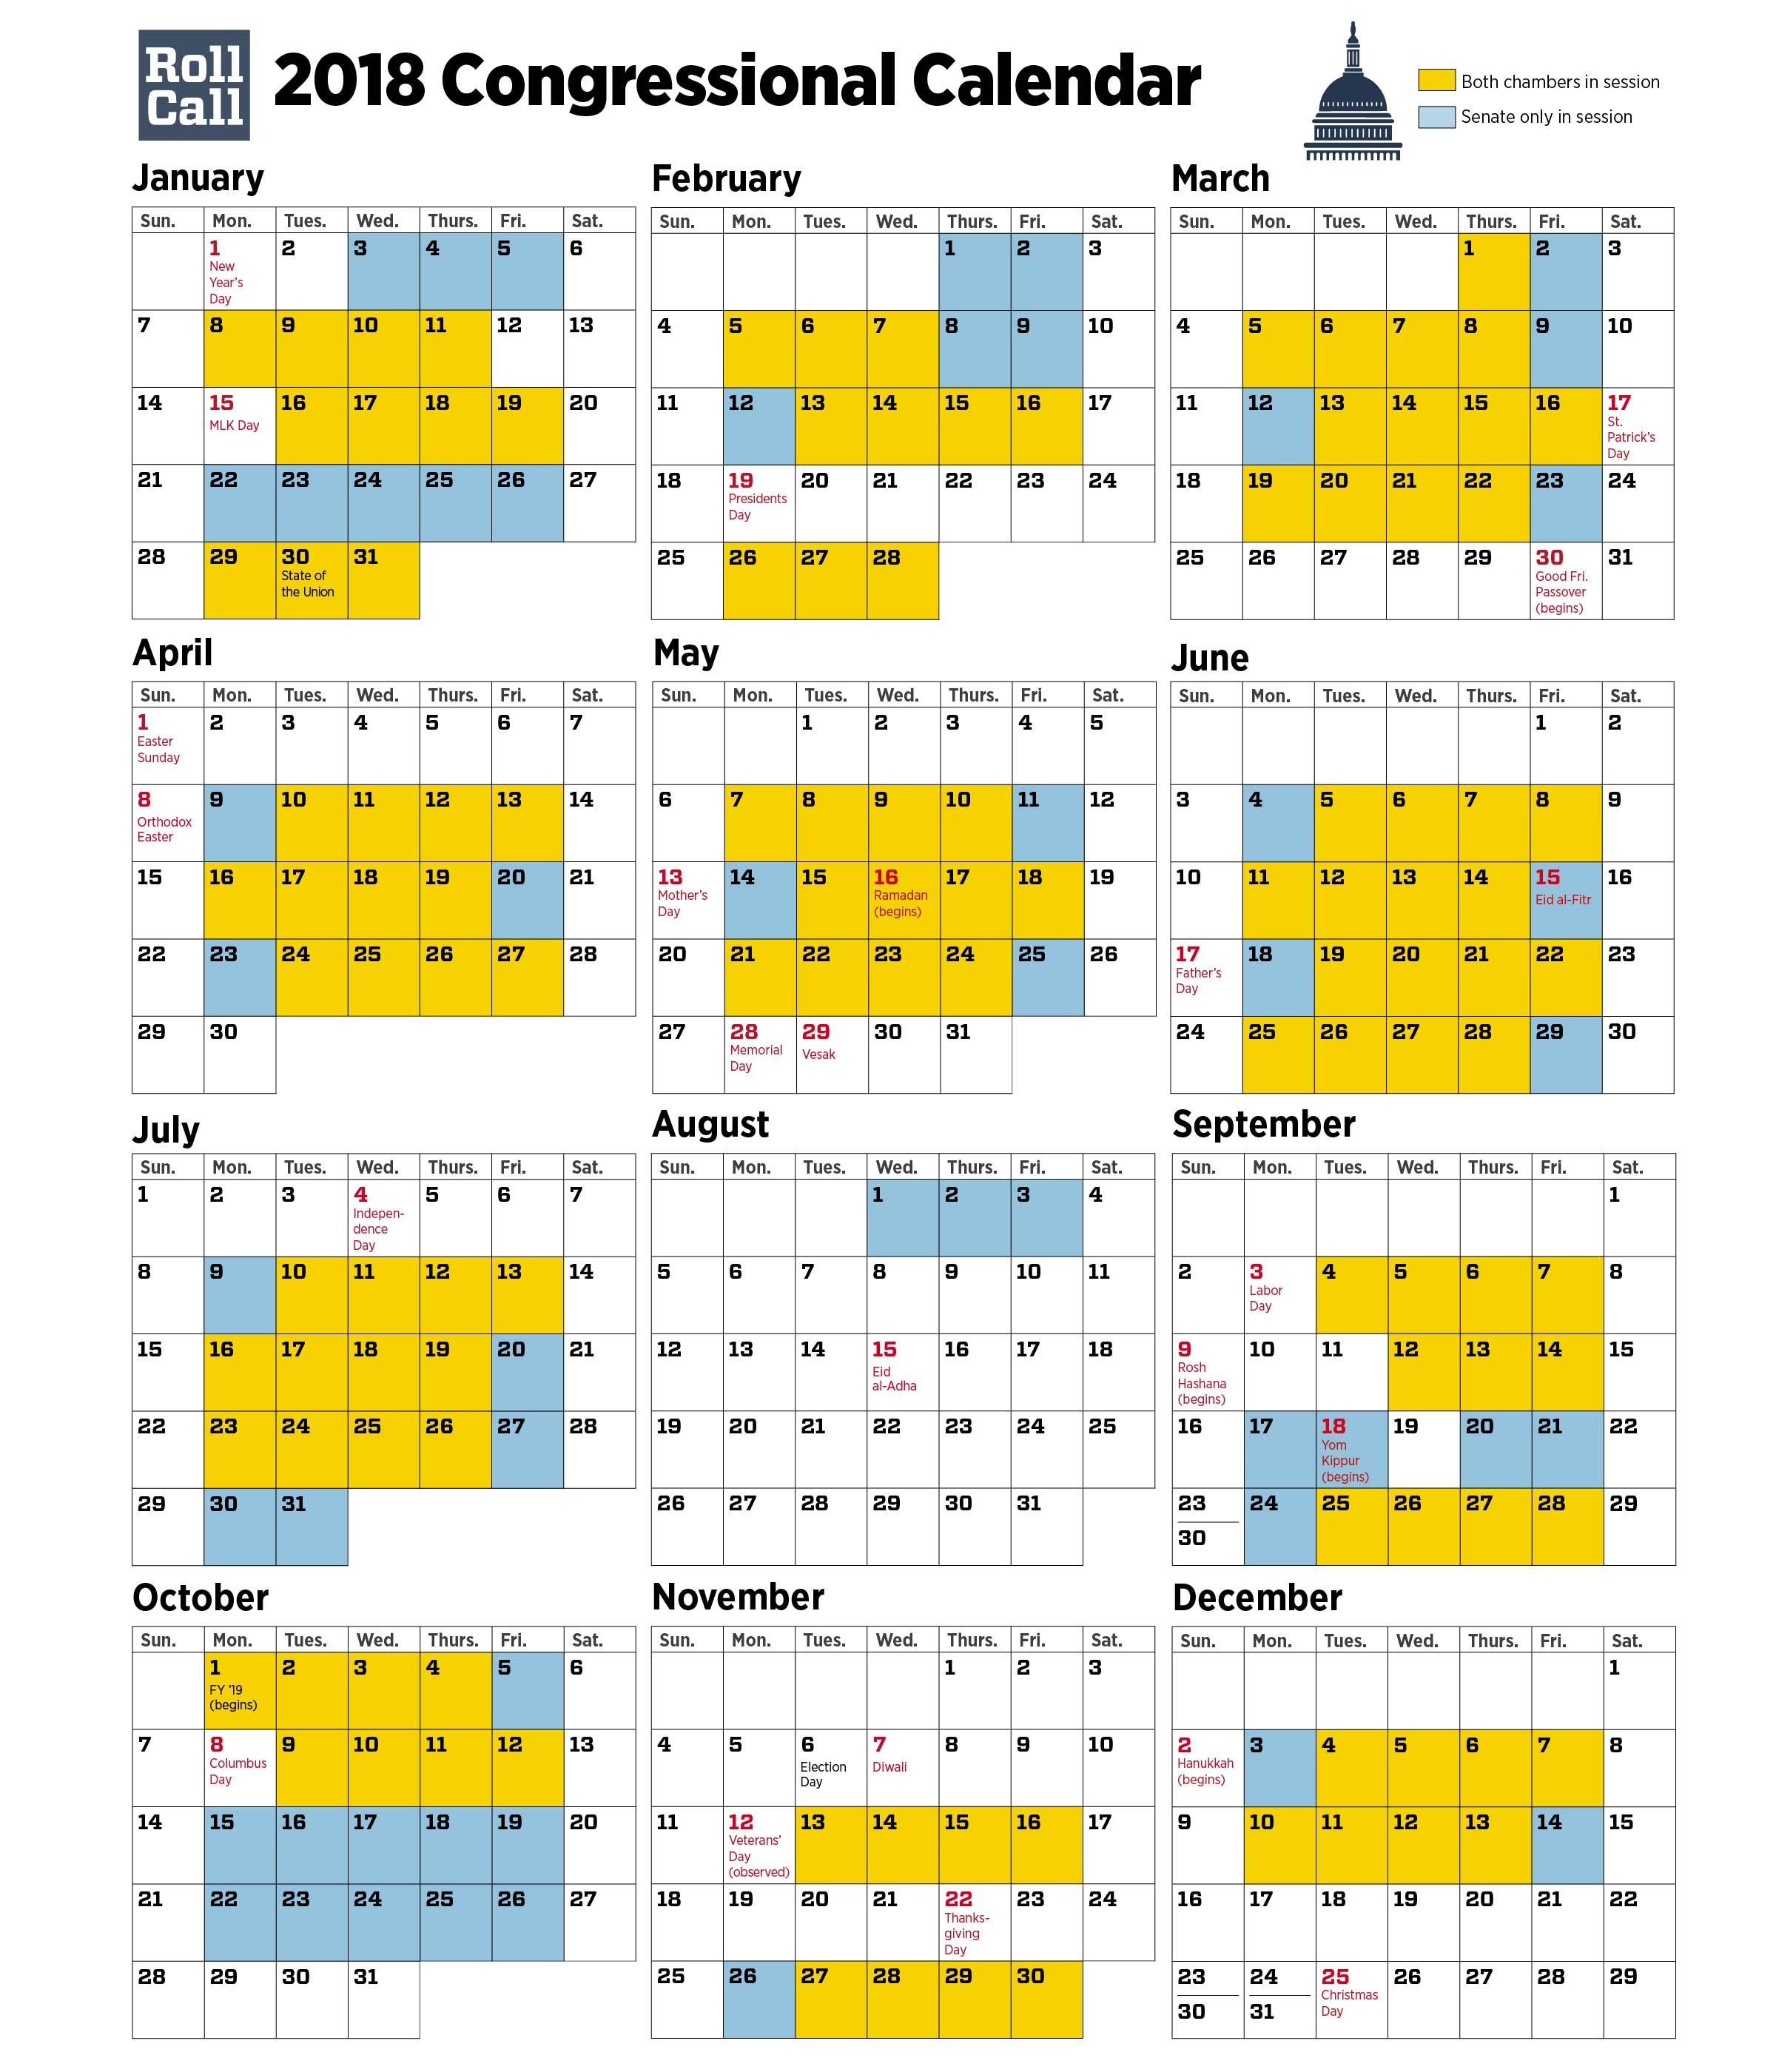 Uw Calendar 2019 2019 federal Agenda | Federal Relations